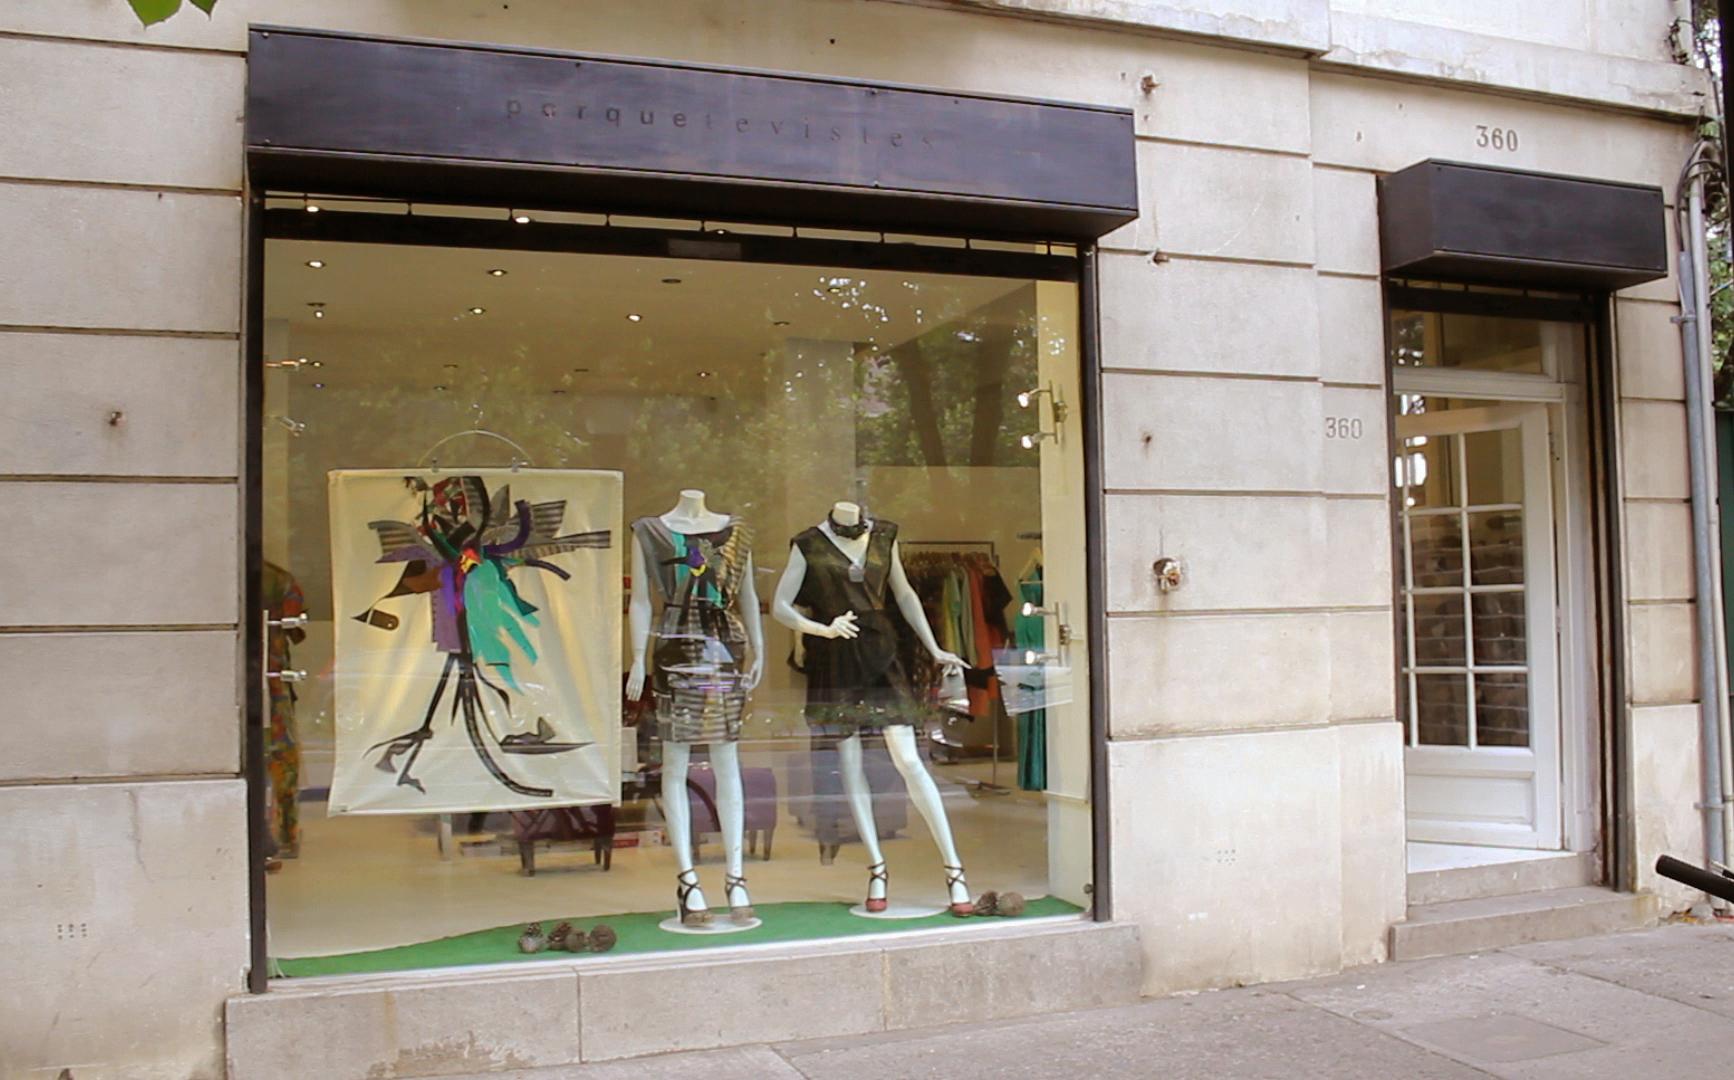 Tiendas de Moda Fashion Report: Porquetevistes